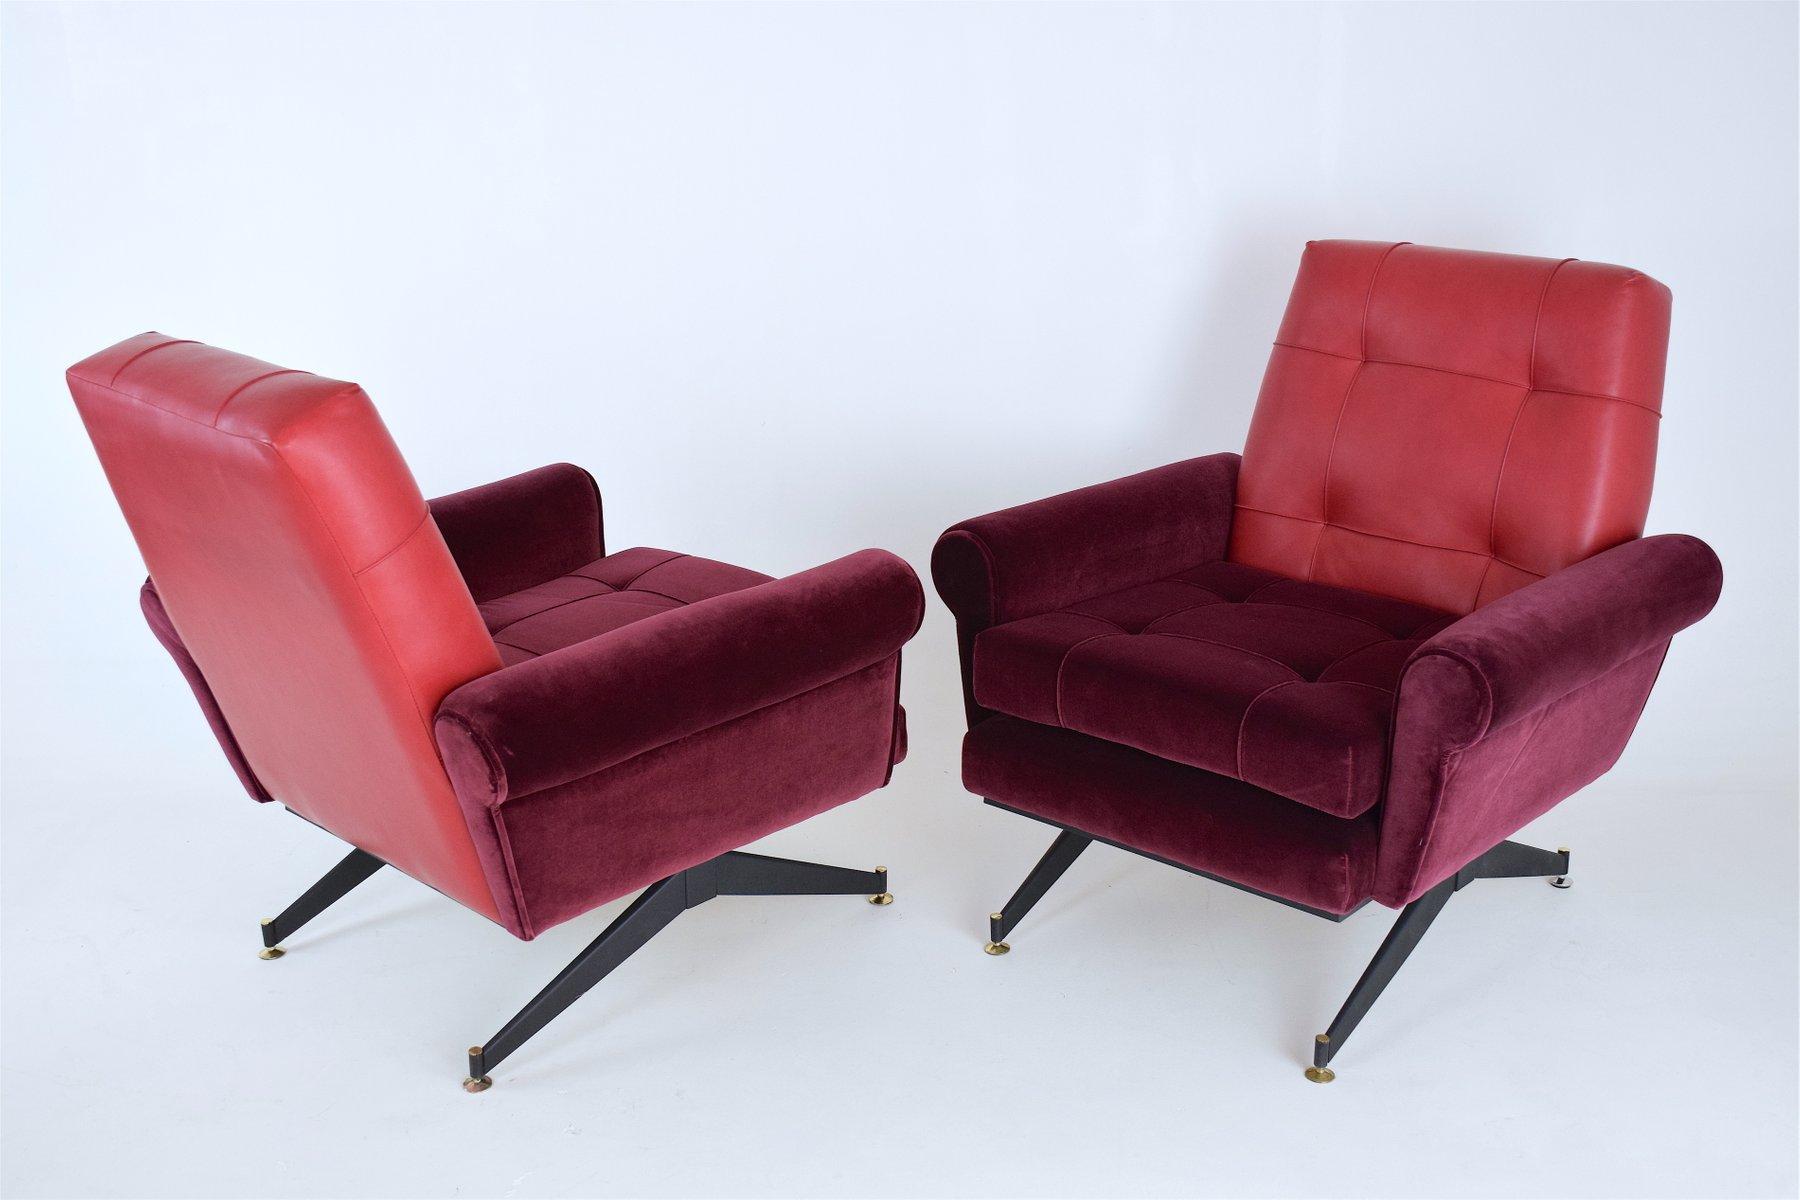 italienische rote mid century sessel aus samt leder 1950er 2er set bei pamono kaufen. Black Bedroom Furniture Sets. Home Design Ideas